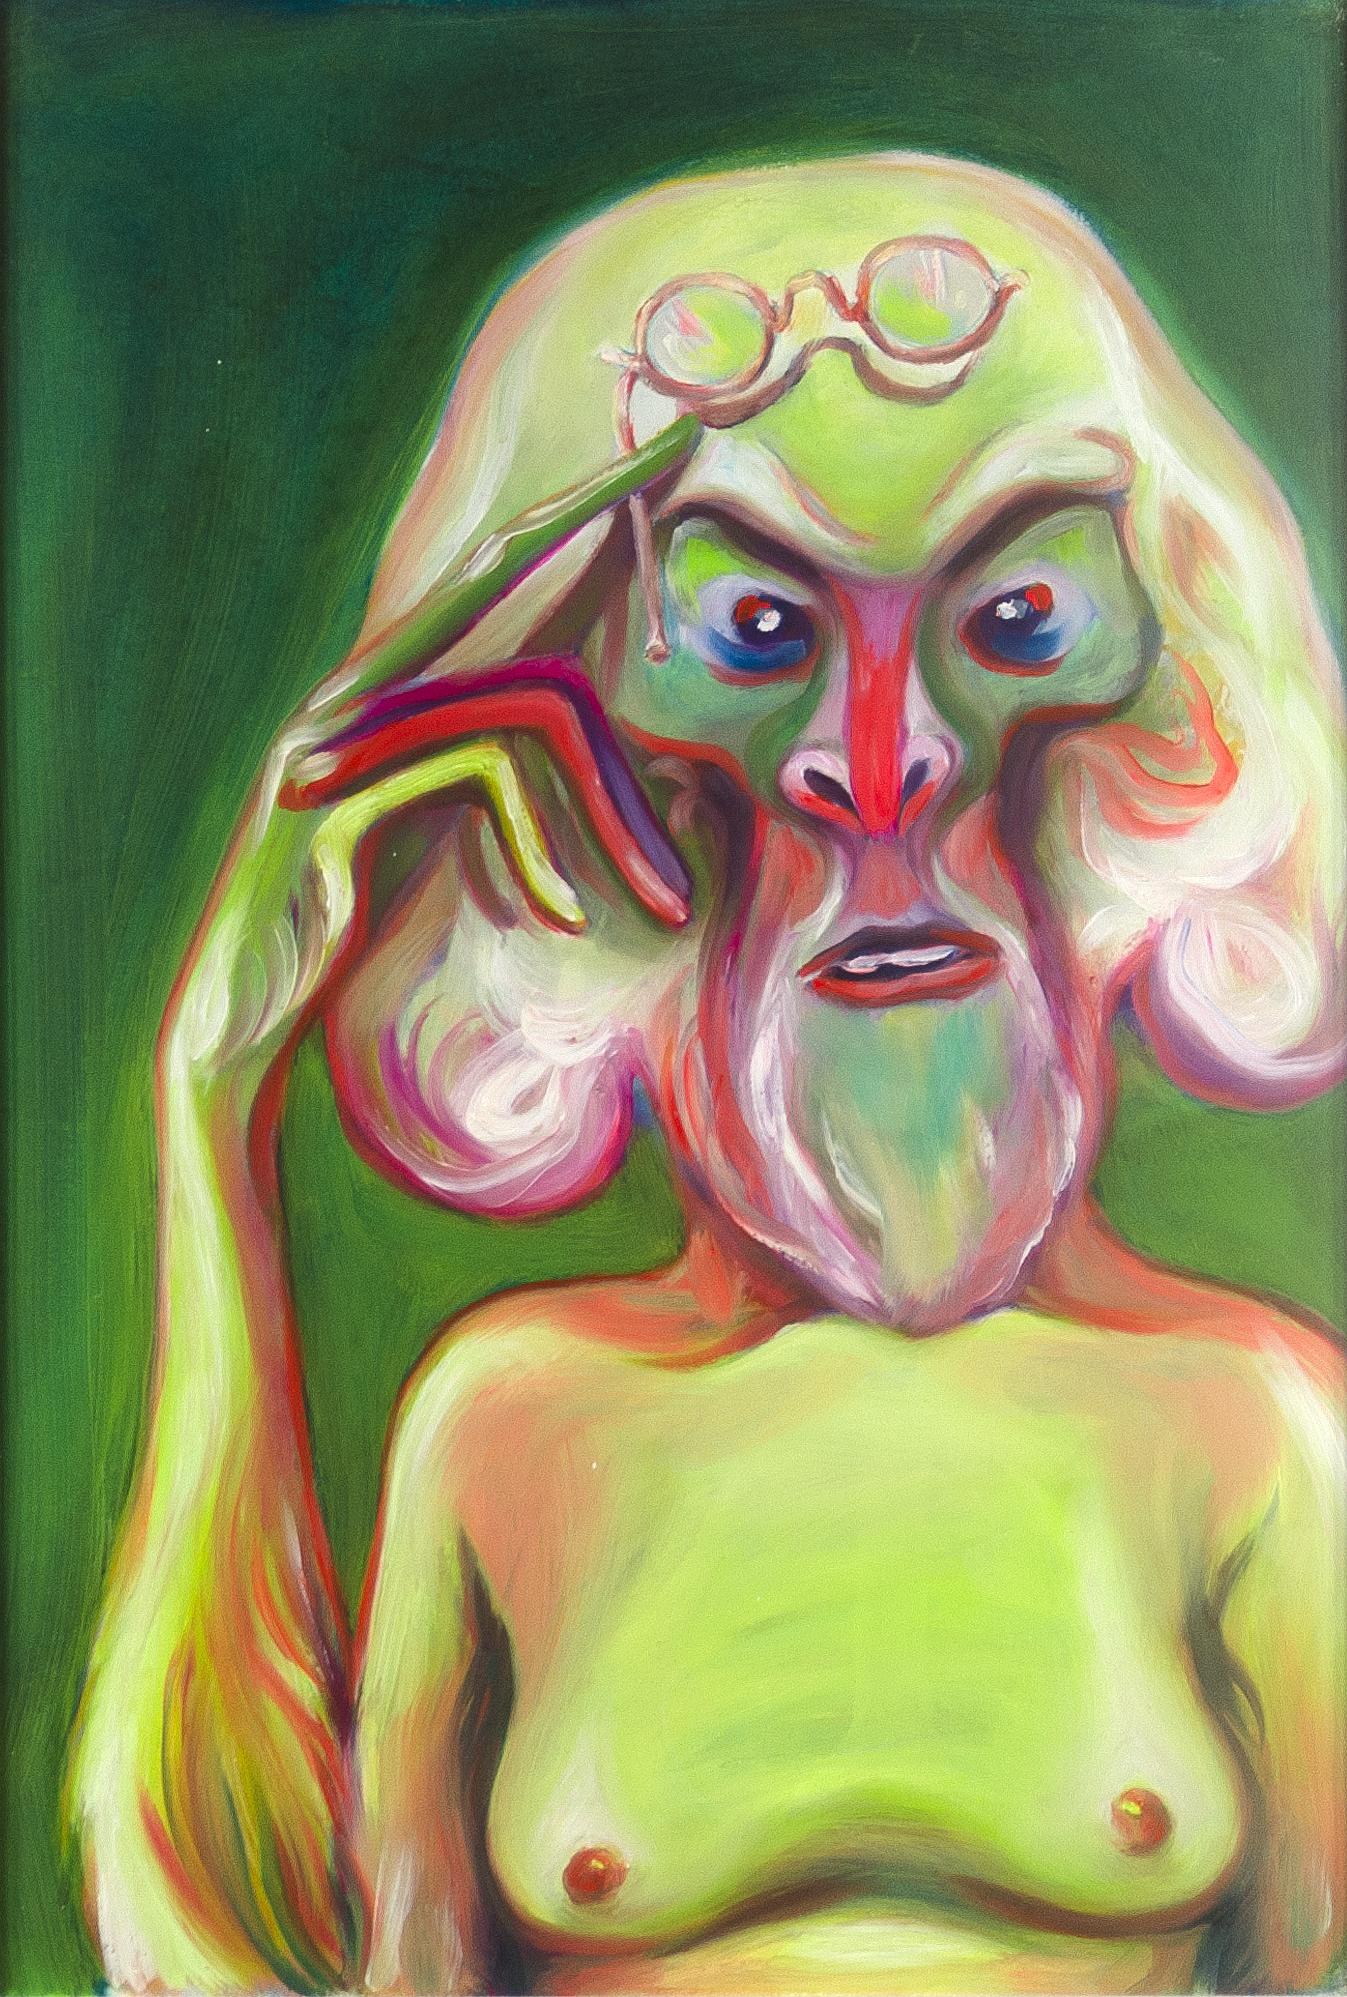 Luigi Presicce - Homo Sapiens Sapiens Sapiens (Scimmia con occhiali) - 2020 - Olio su carta - 50x35cm - fot_n_ 2452 - Cod_20Pre2020